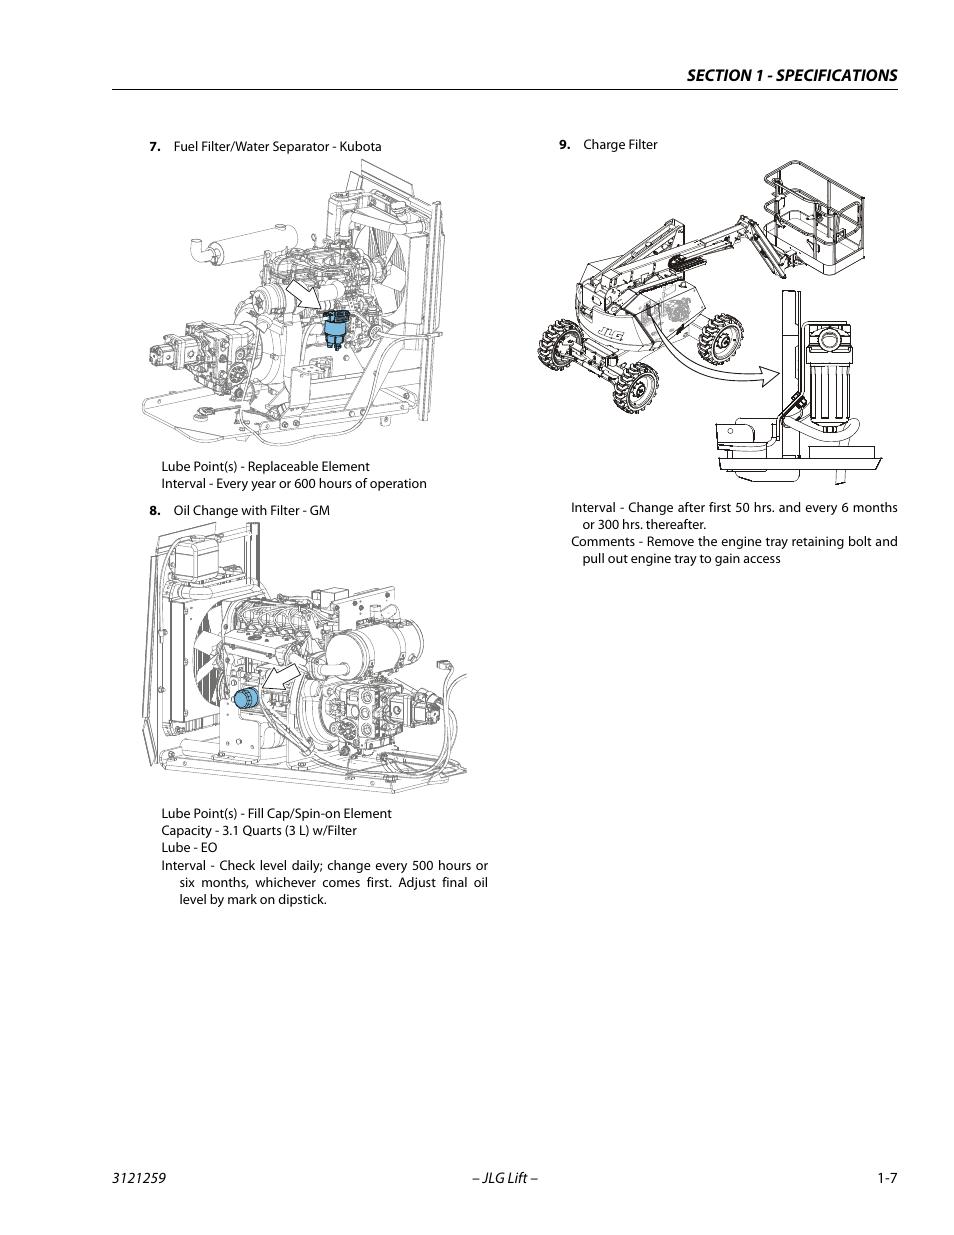 JLG 340AJ Service Manual User Manual | Page 23 / 348